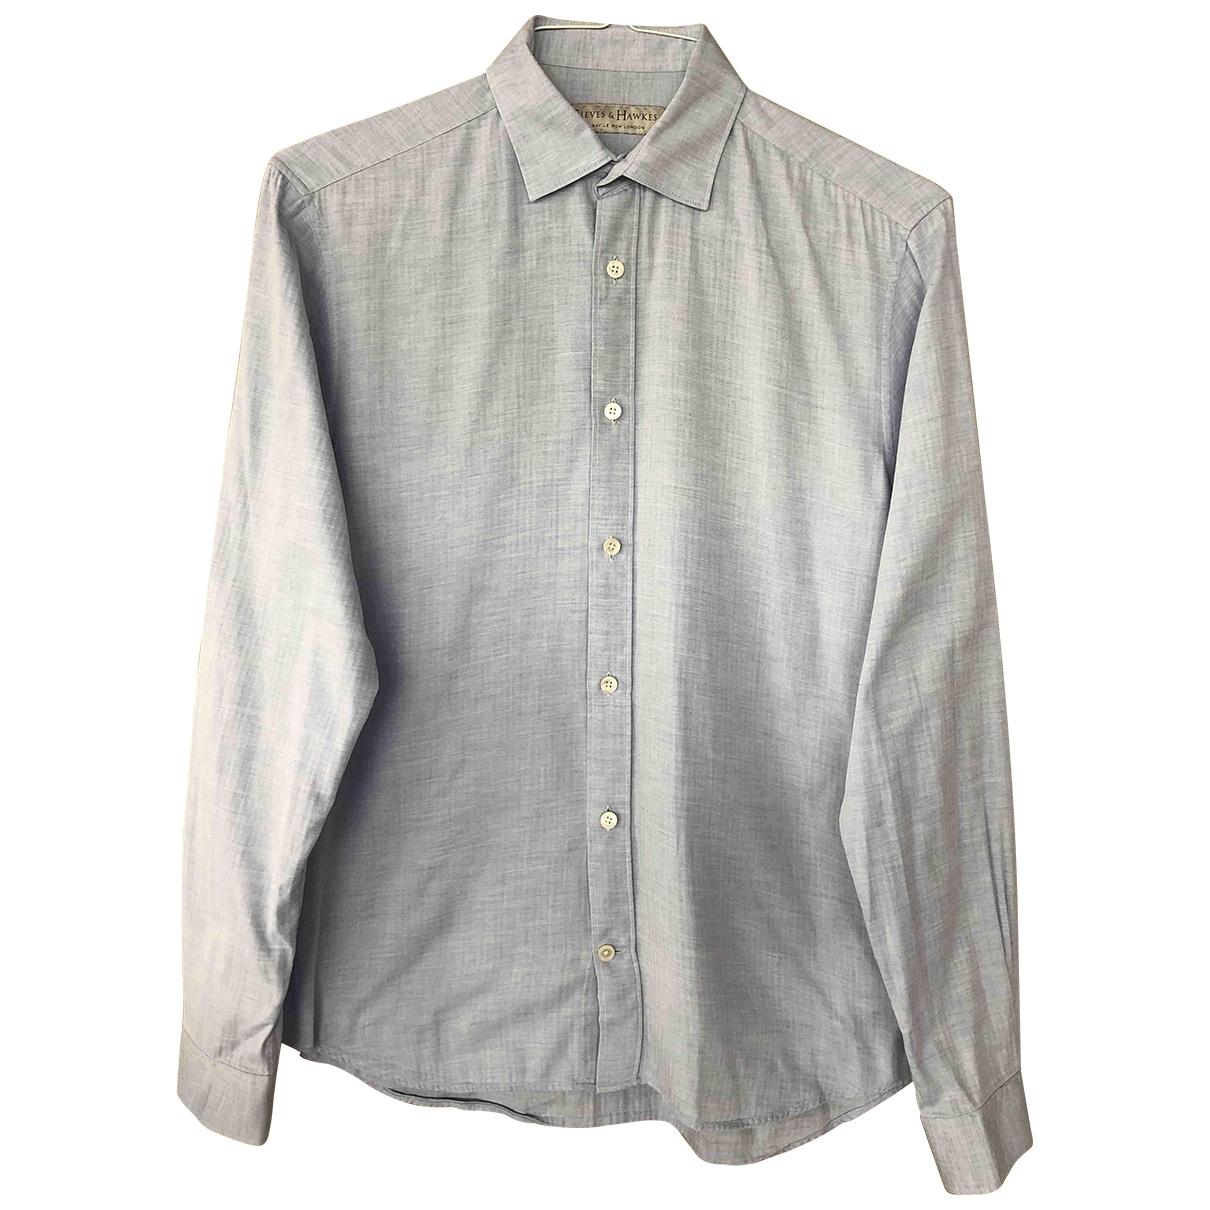 Camisas Gieves & Hawkes